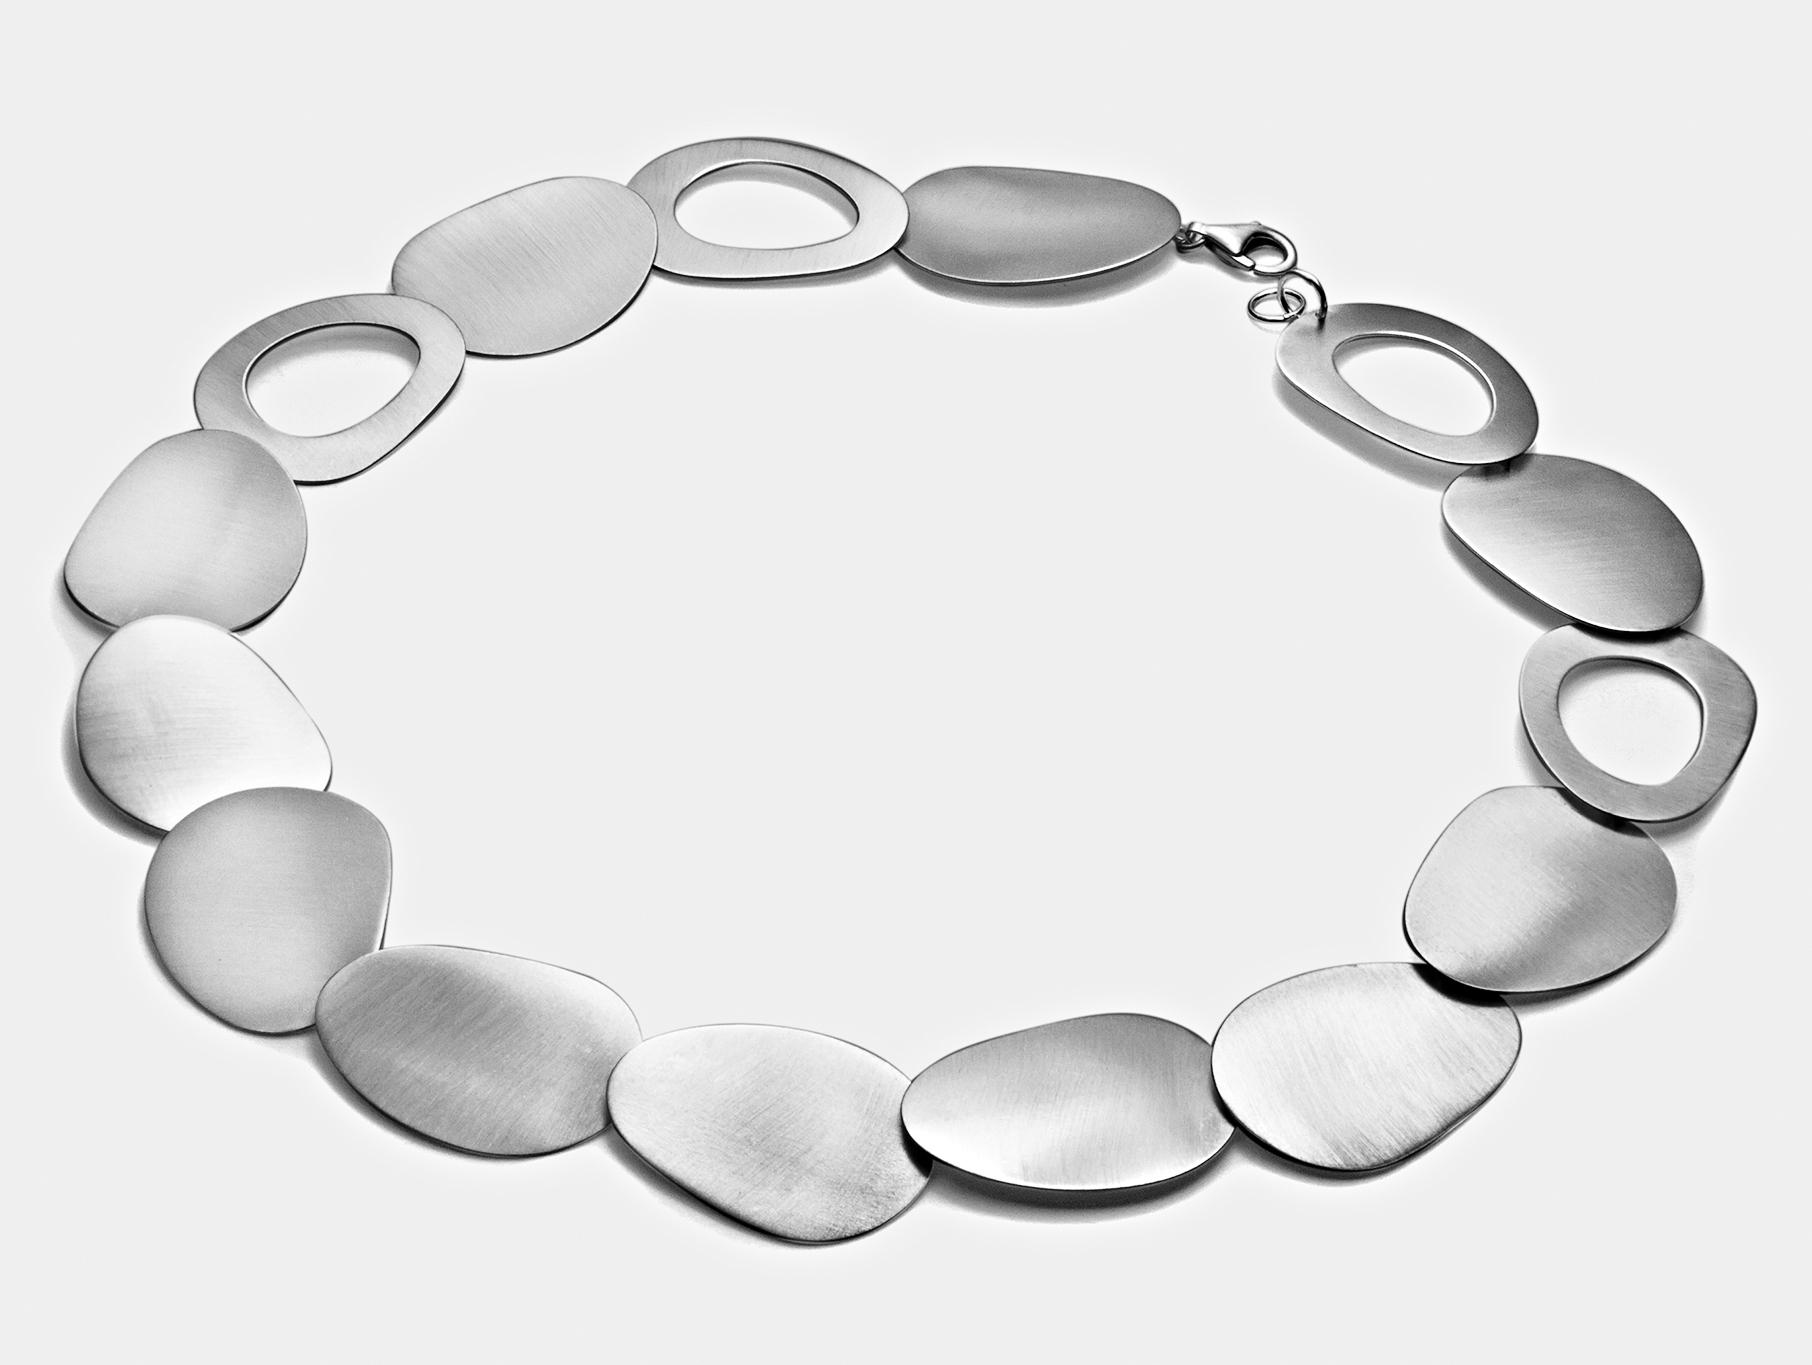 Kelim Jewelry Design Stepping Stone necklace   JCK On Your Market